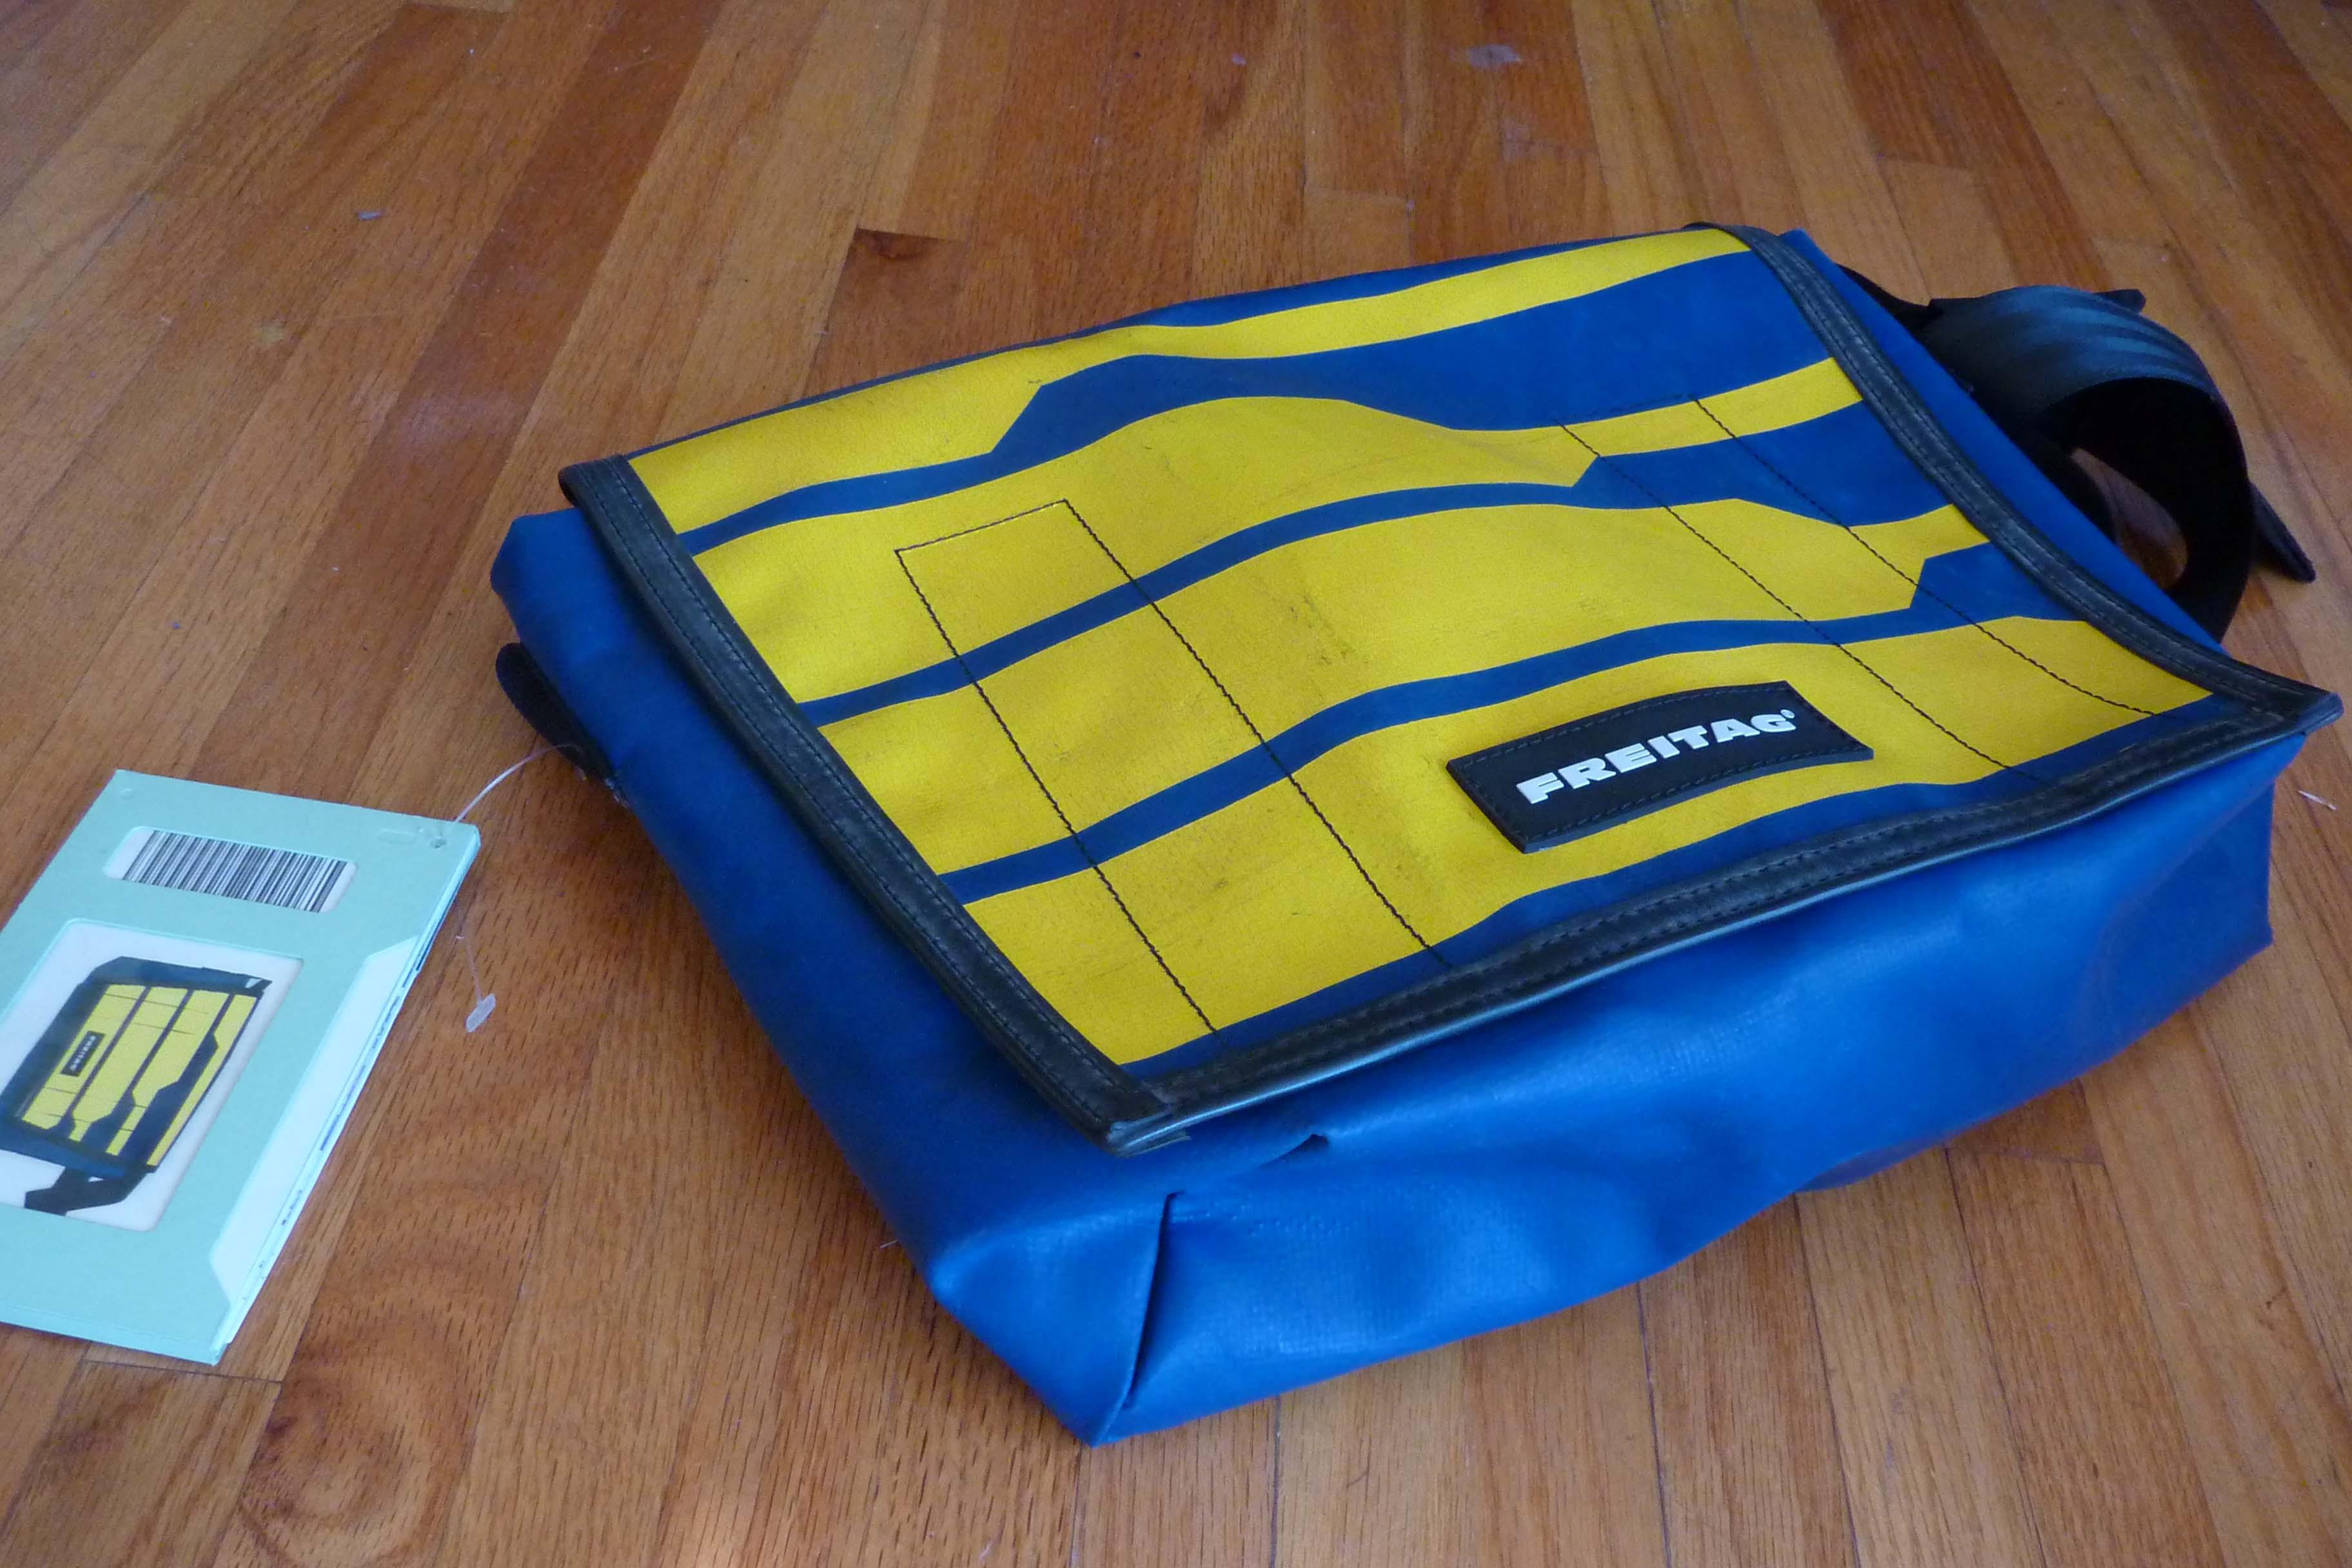 Freitag Dexter Messenger Bag Review | Craft Collective